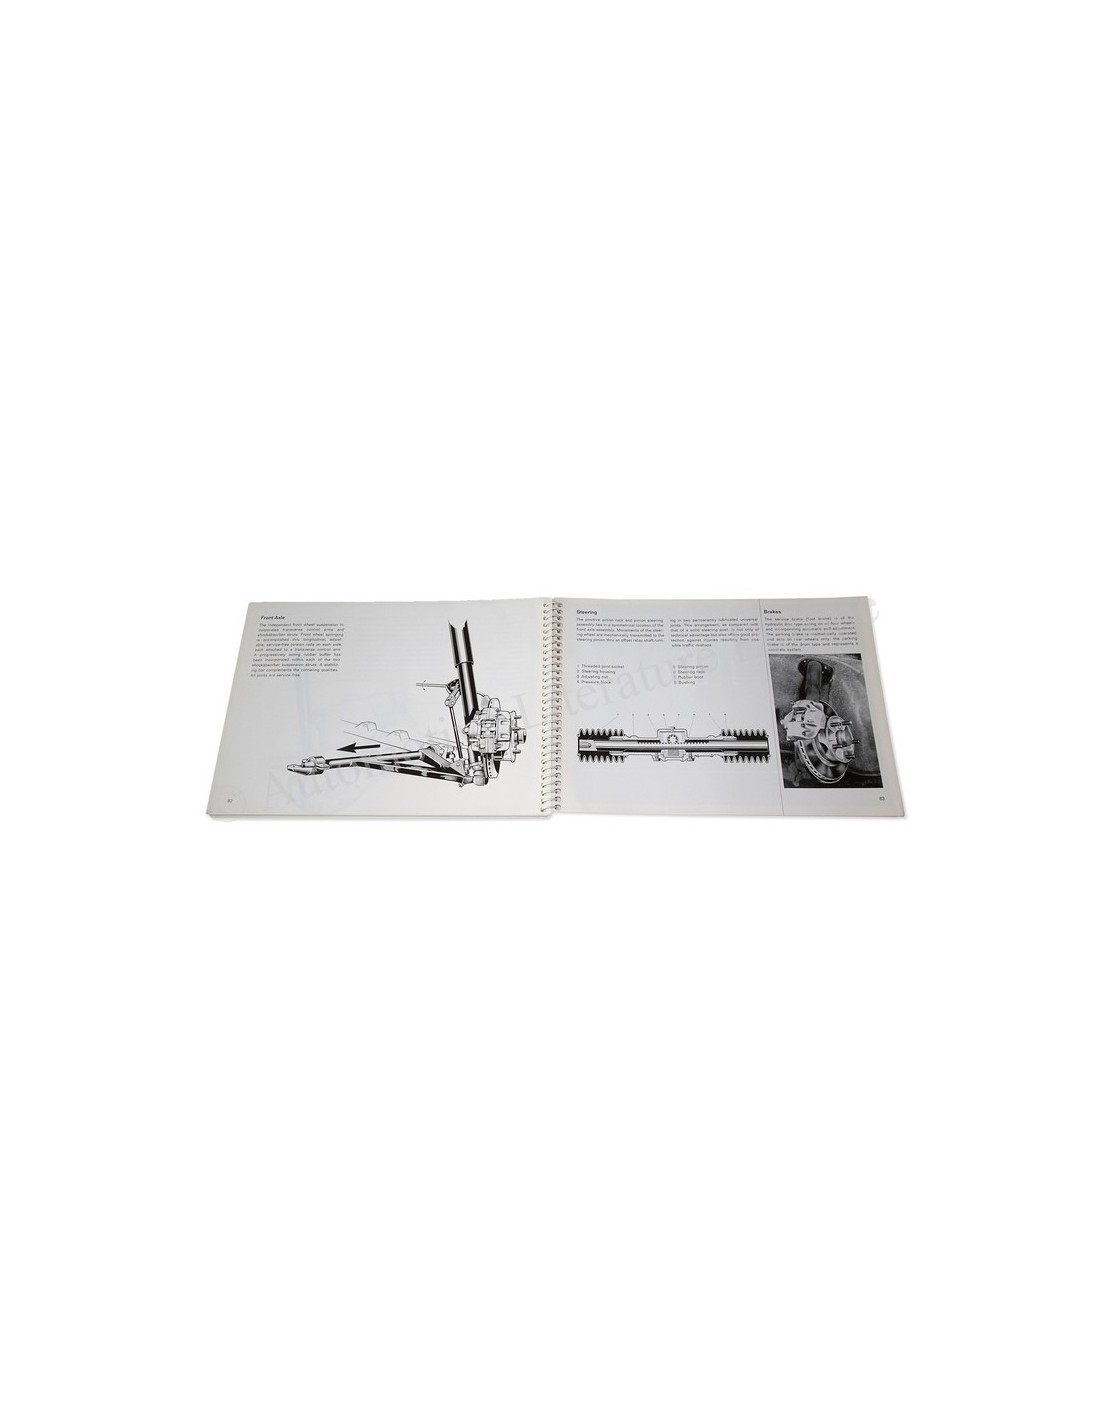 1967 porsche 911 s owner 39 s manual english. Black Bedroom Furniture Sets. Home Design Ideas